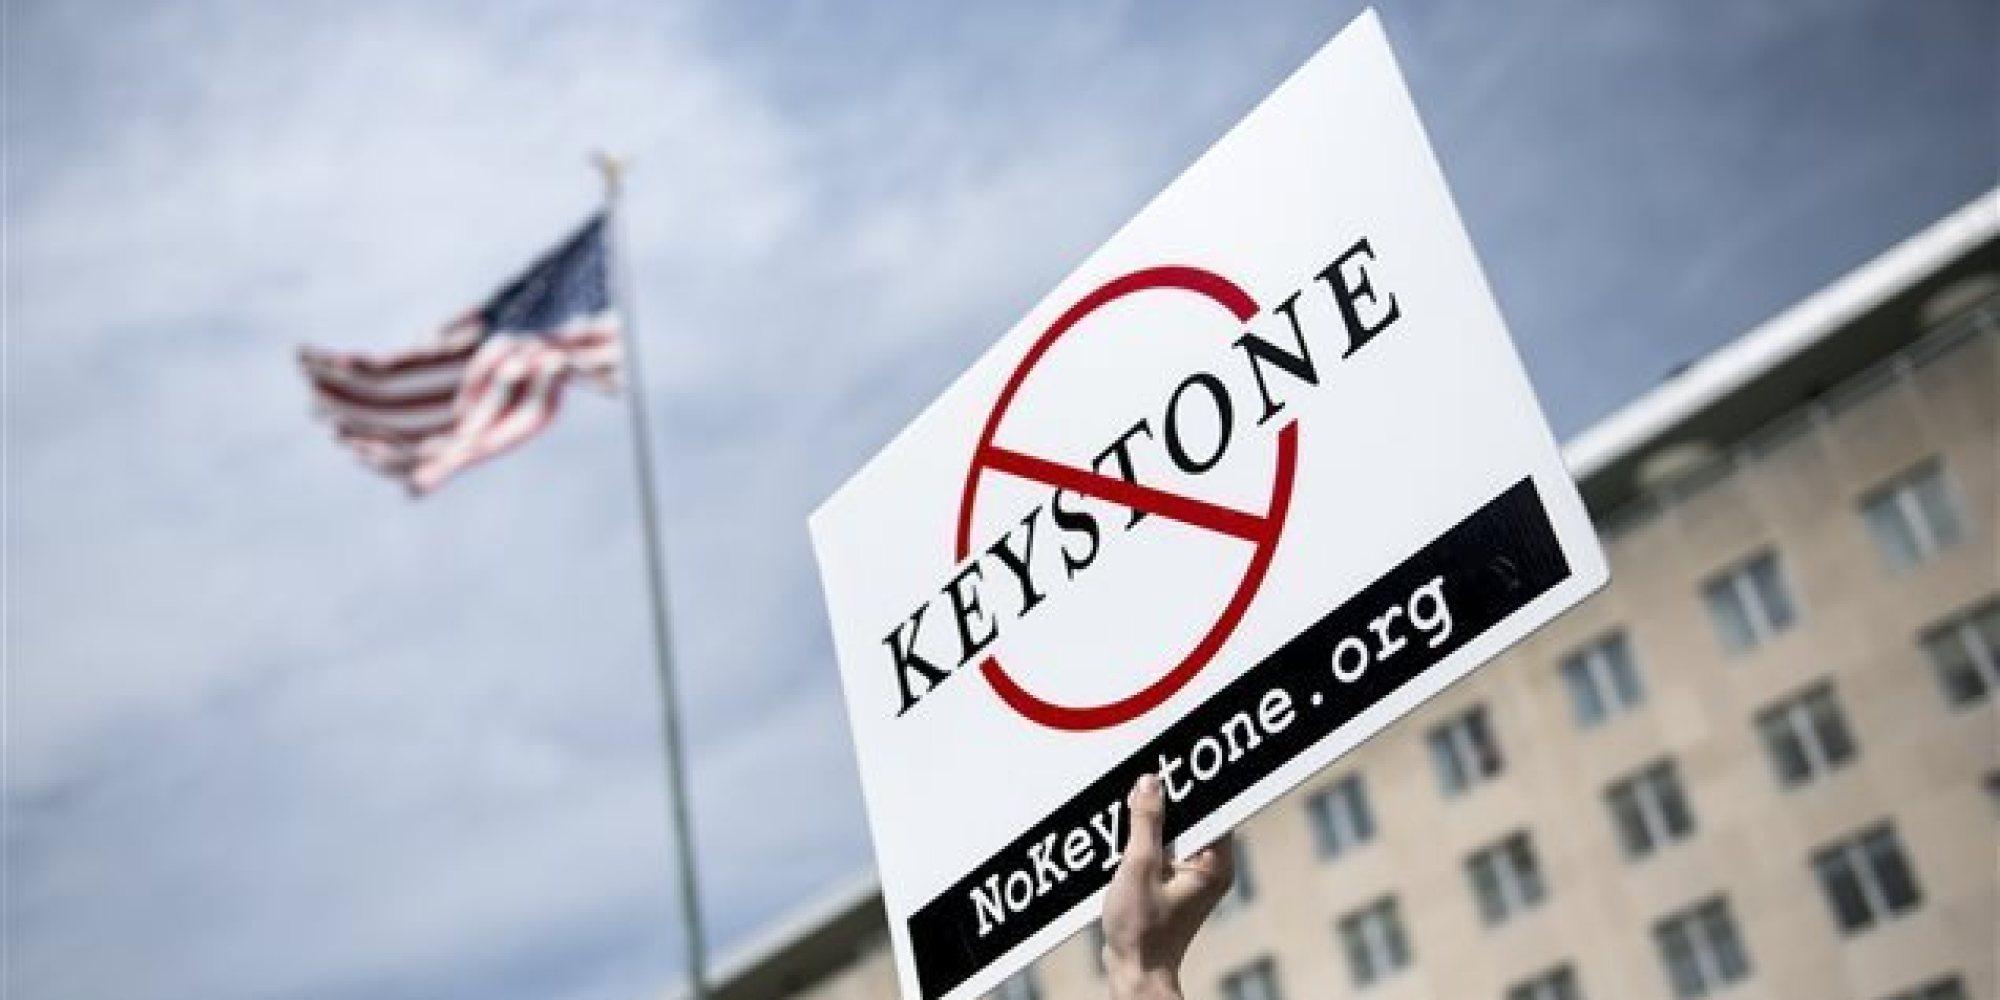 Keystone XL : la fin d'un symbole